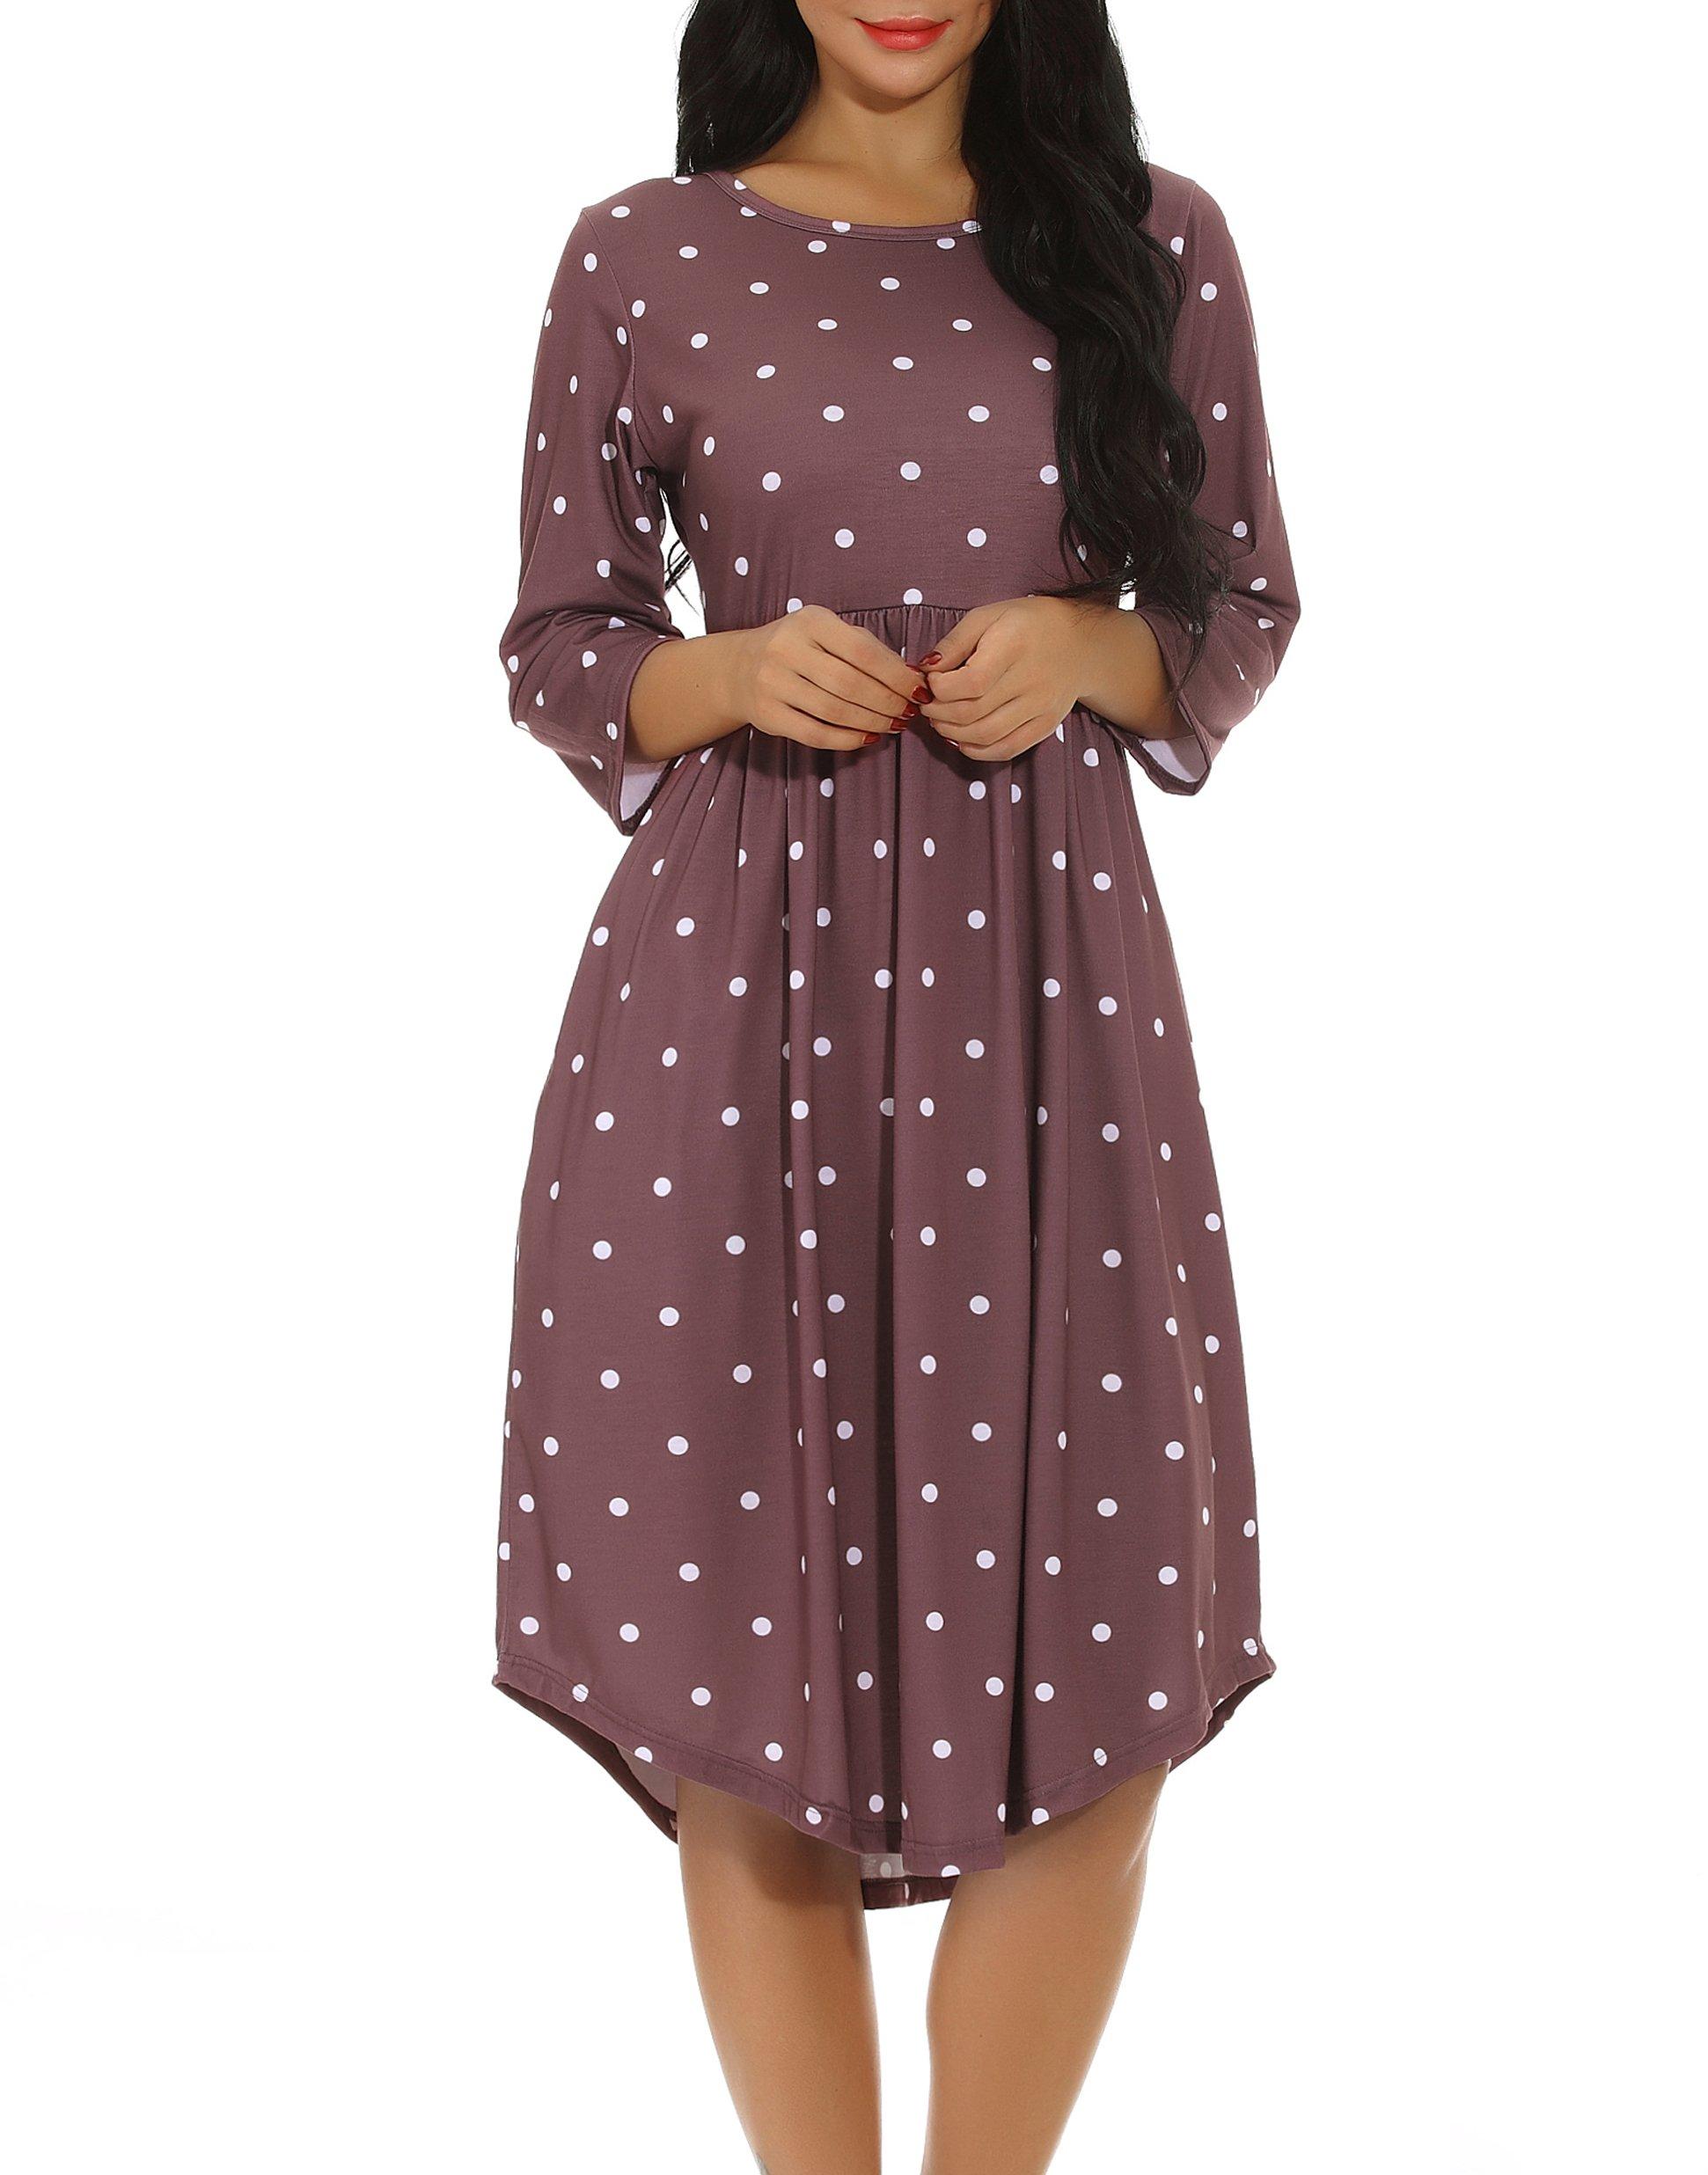 Chvity Women 3/4 Sleeve Pleated Polka Dot Loose Swing Midi Dress Empire Waist Casual Dress with Pocket (Coffee, S)